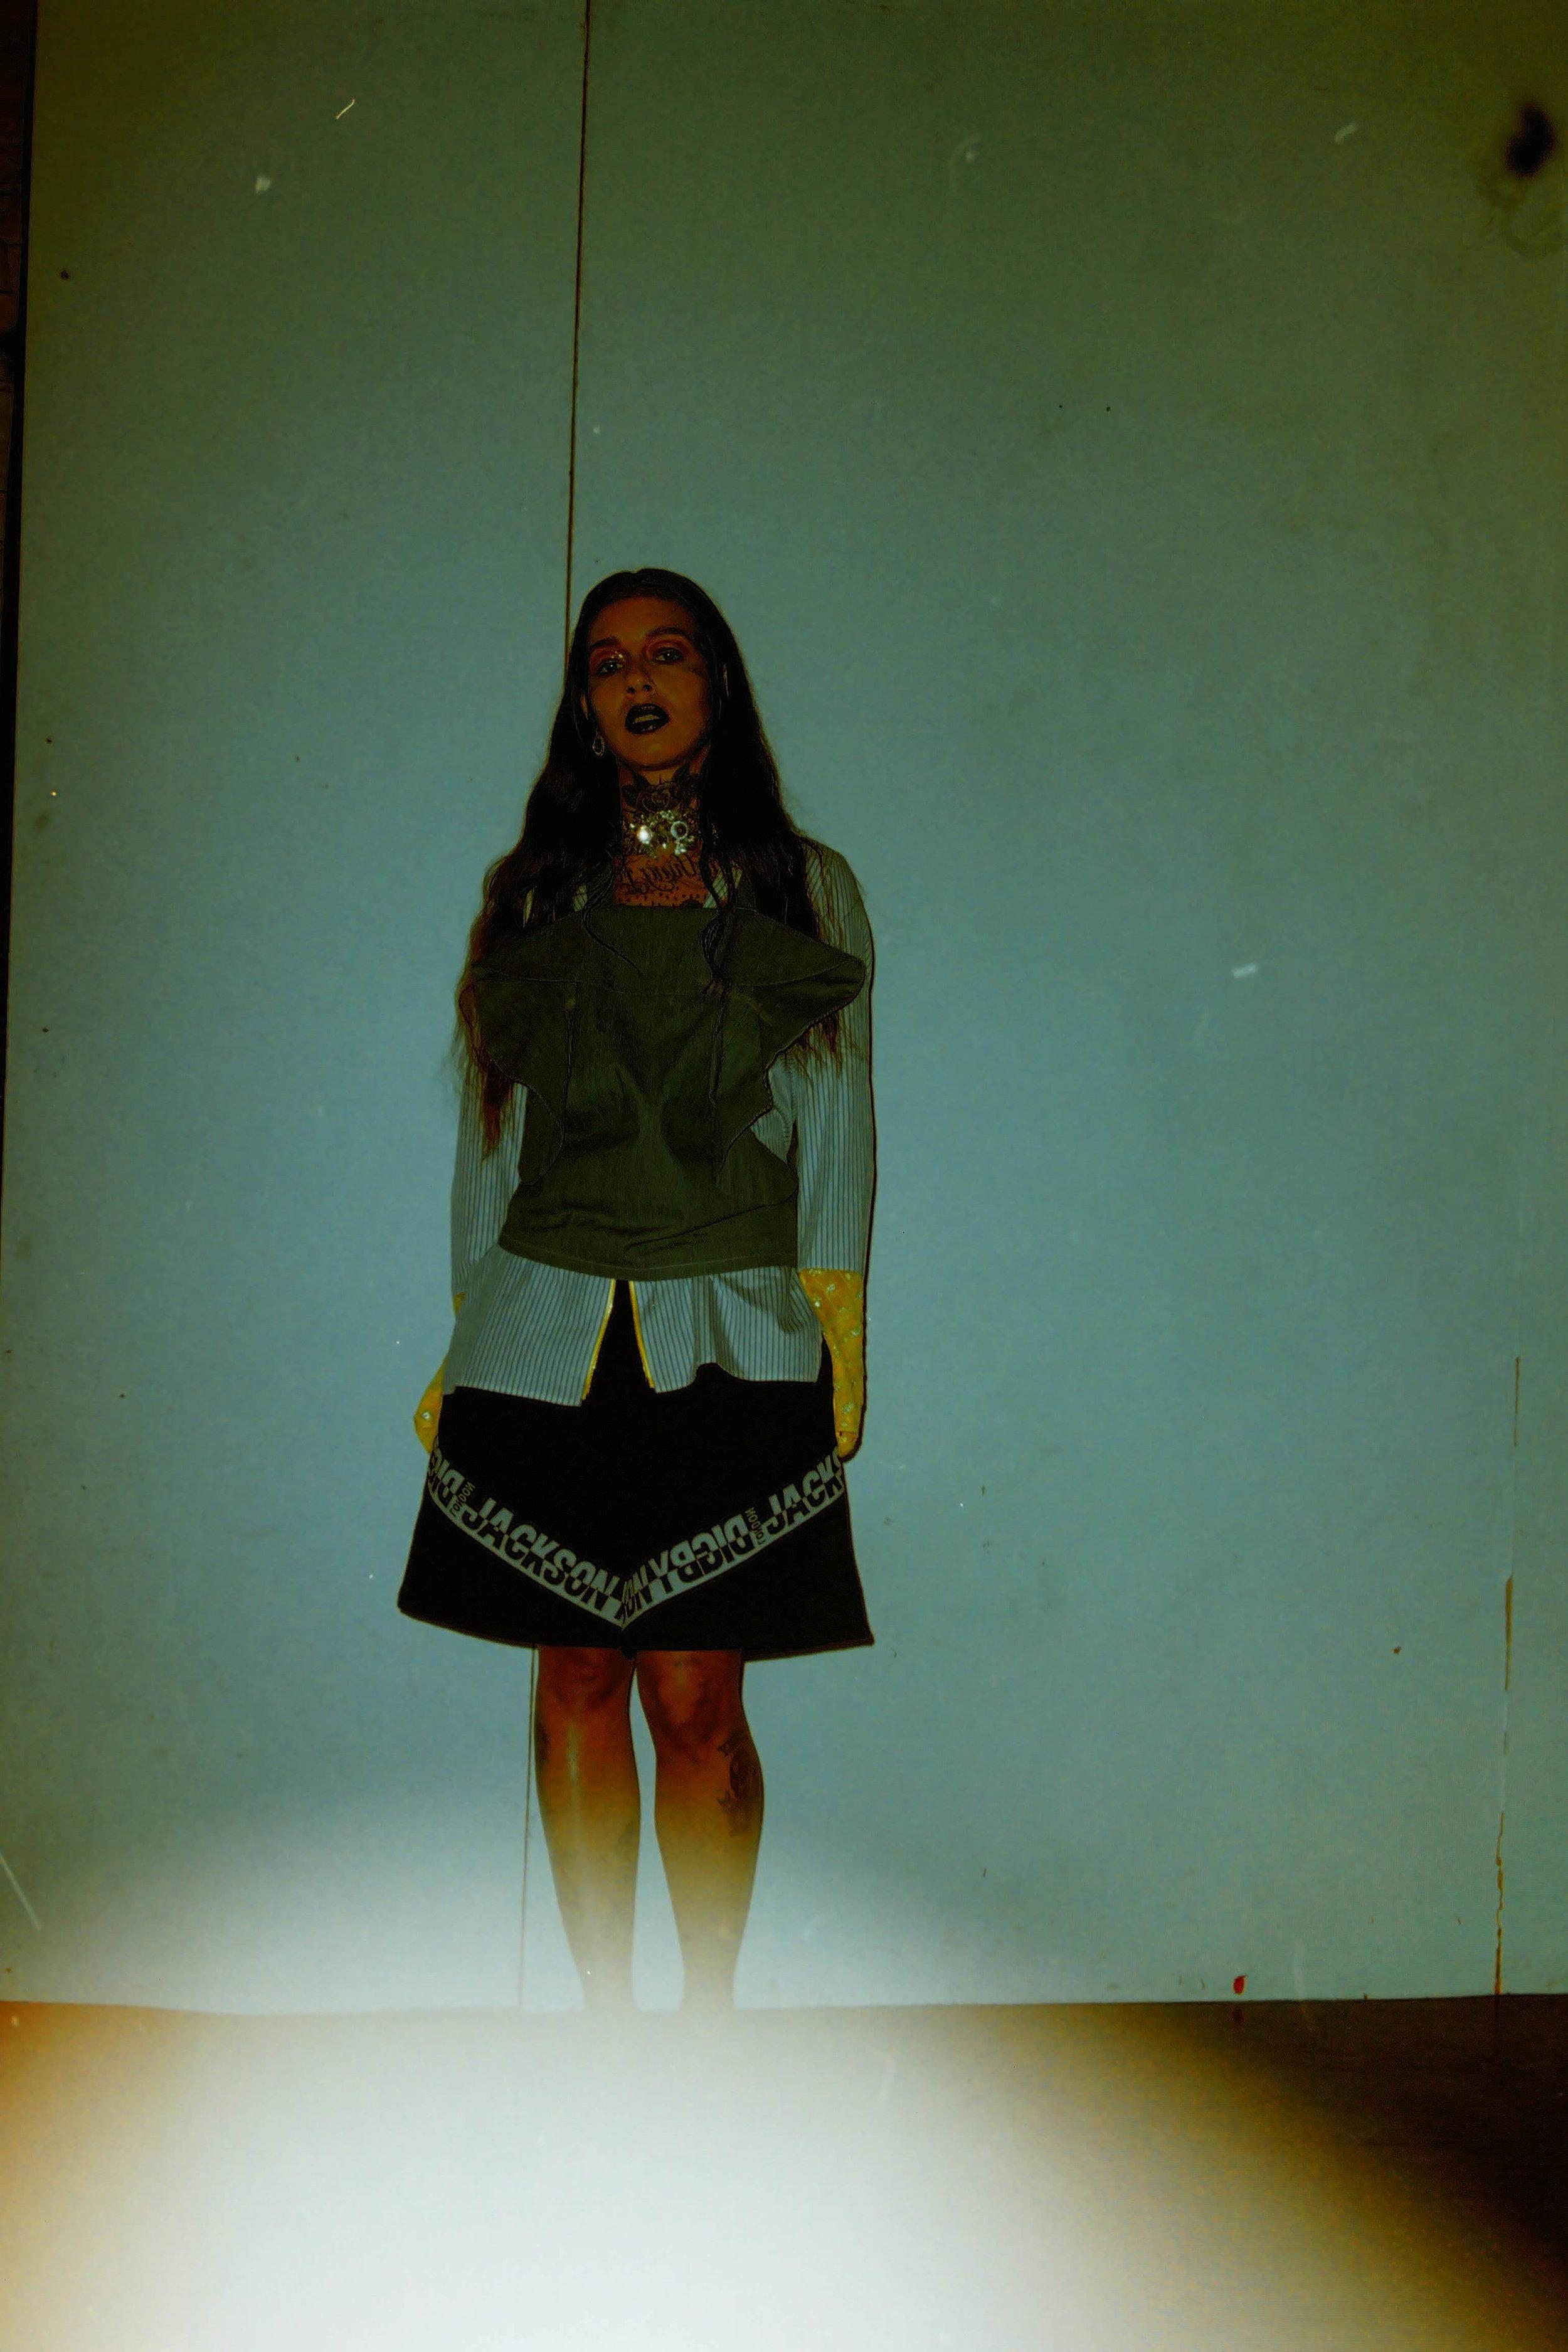 shirt ADELINA RUSU, tank TOIT VOLANT, shorts DIGBY JACKSON chocker + earrings JEWELRY BAR, shoes Intentionally____.